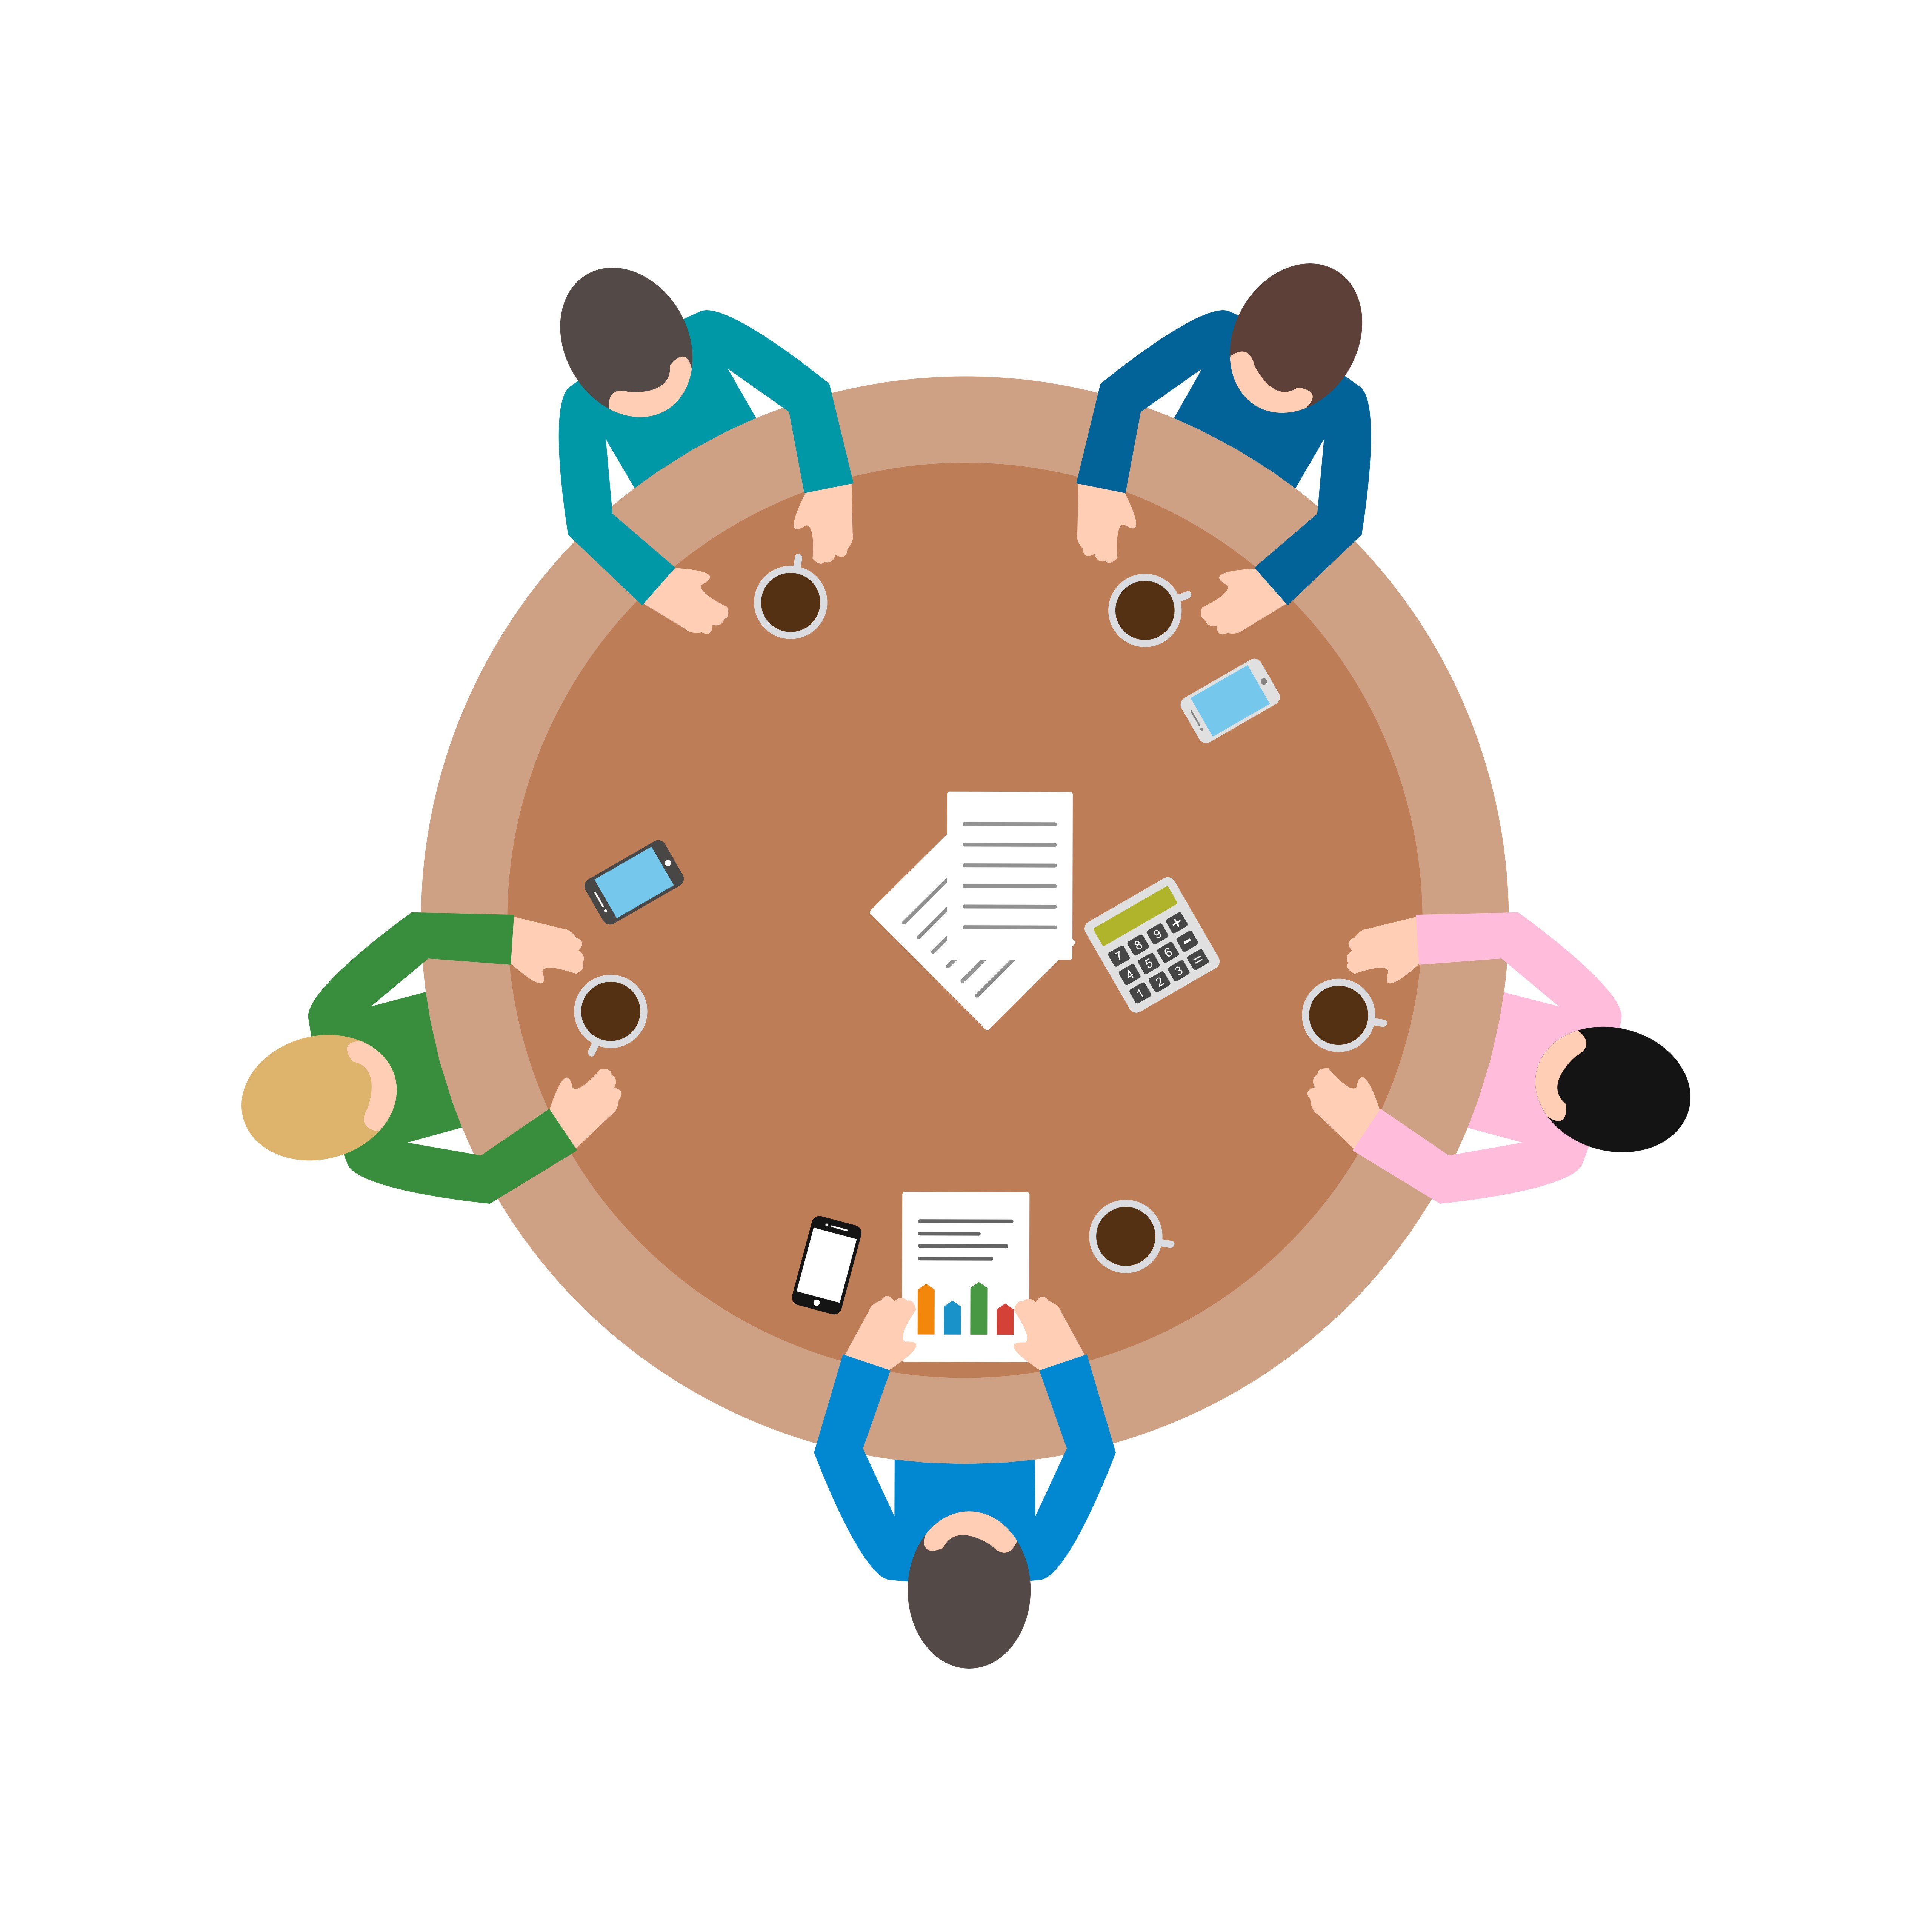 meeting vector icon